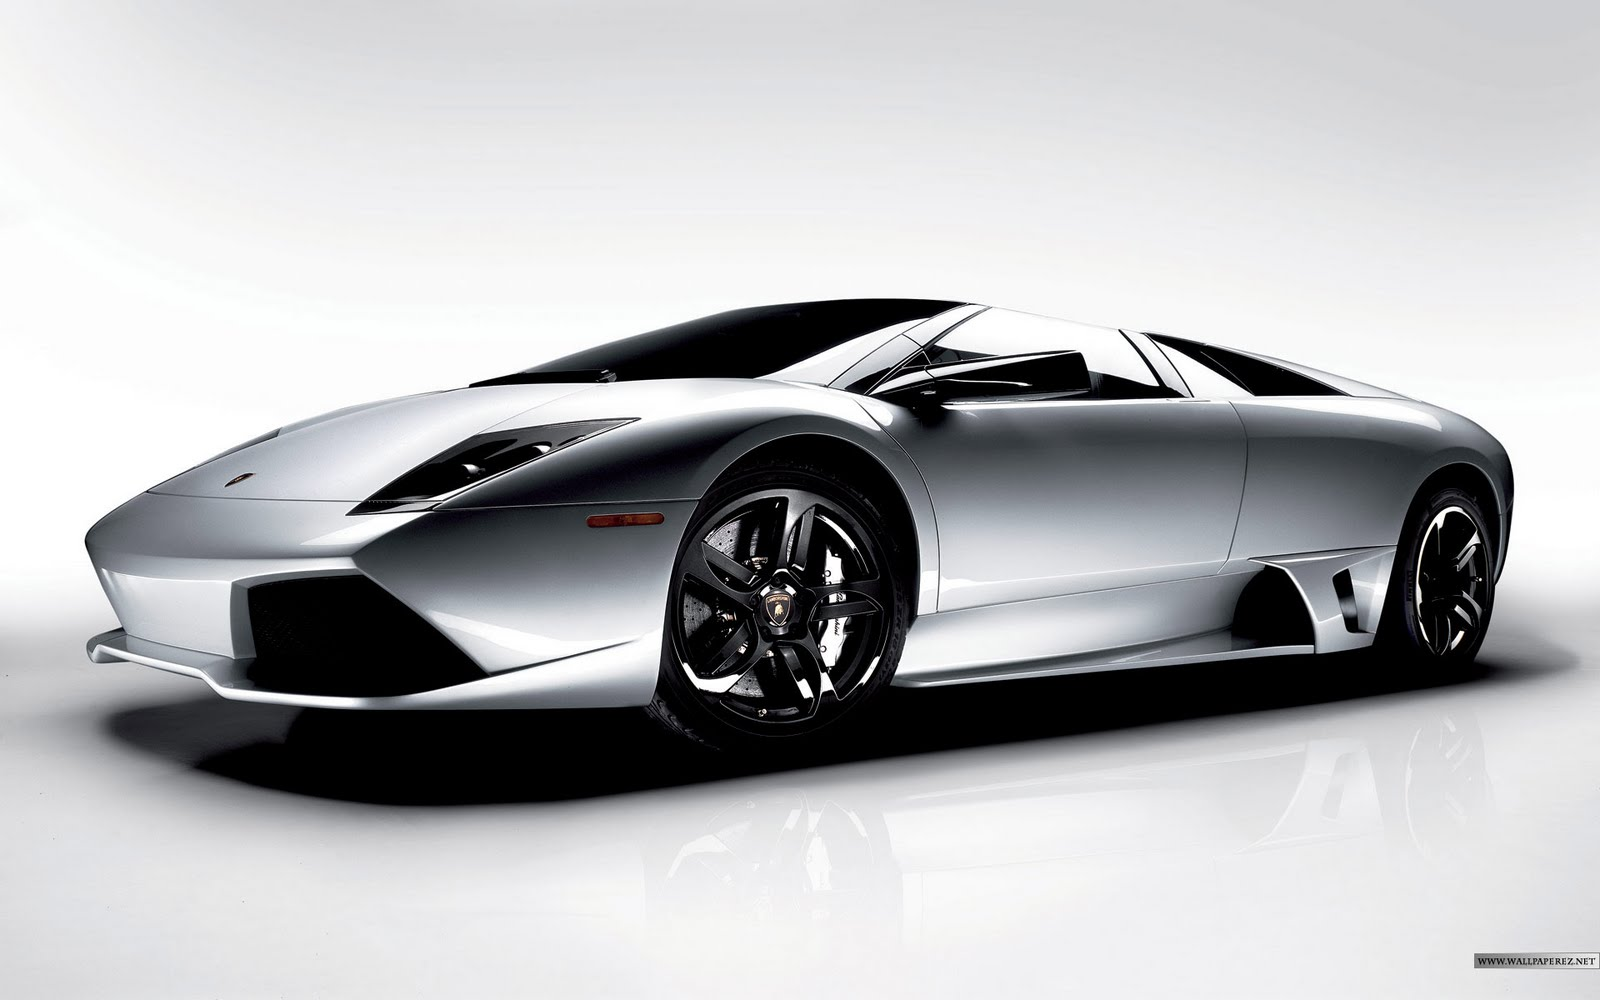 Lamborghini+murcielago+sv+